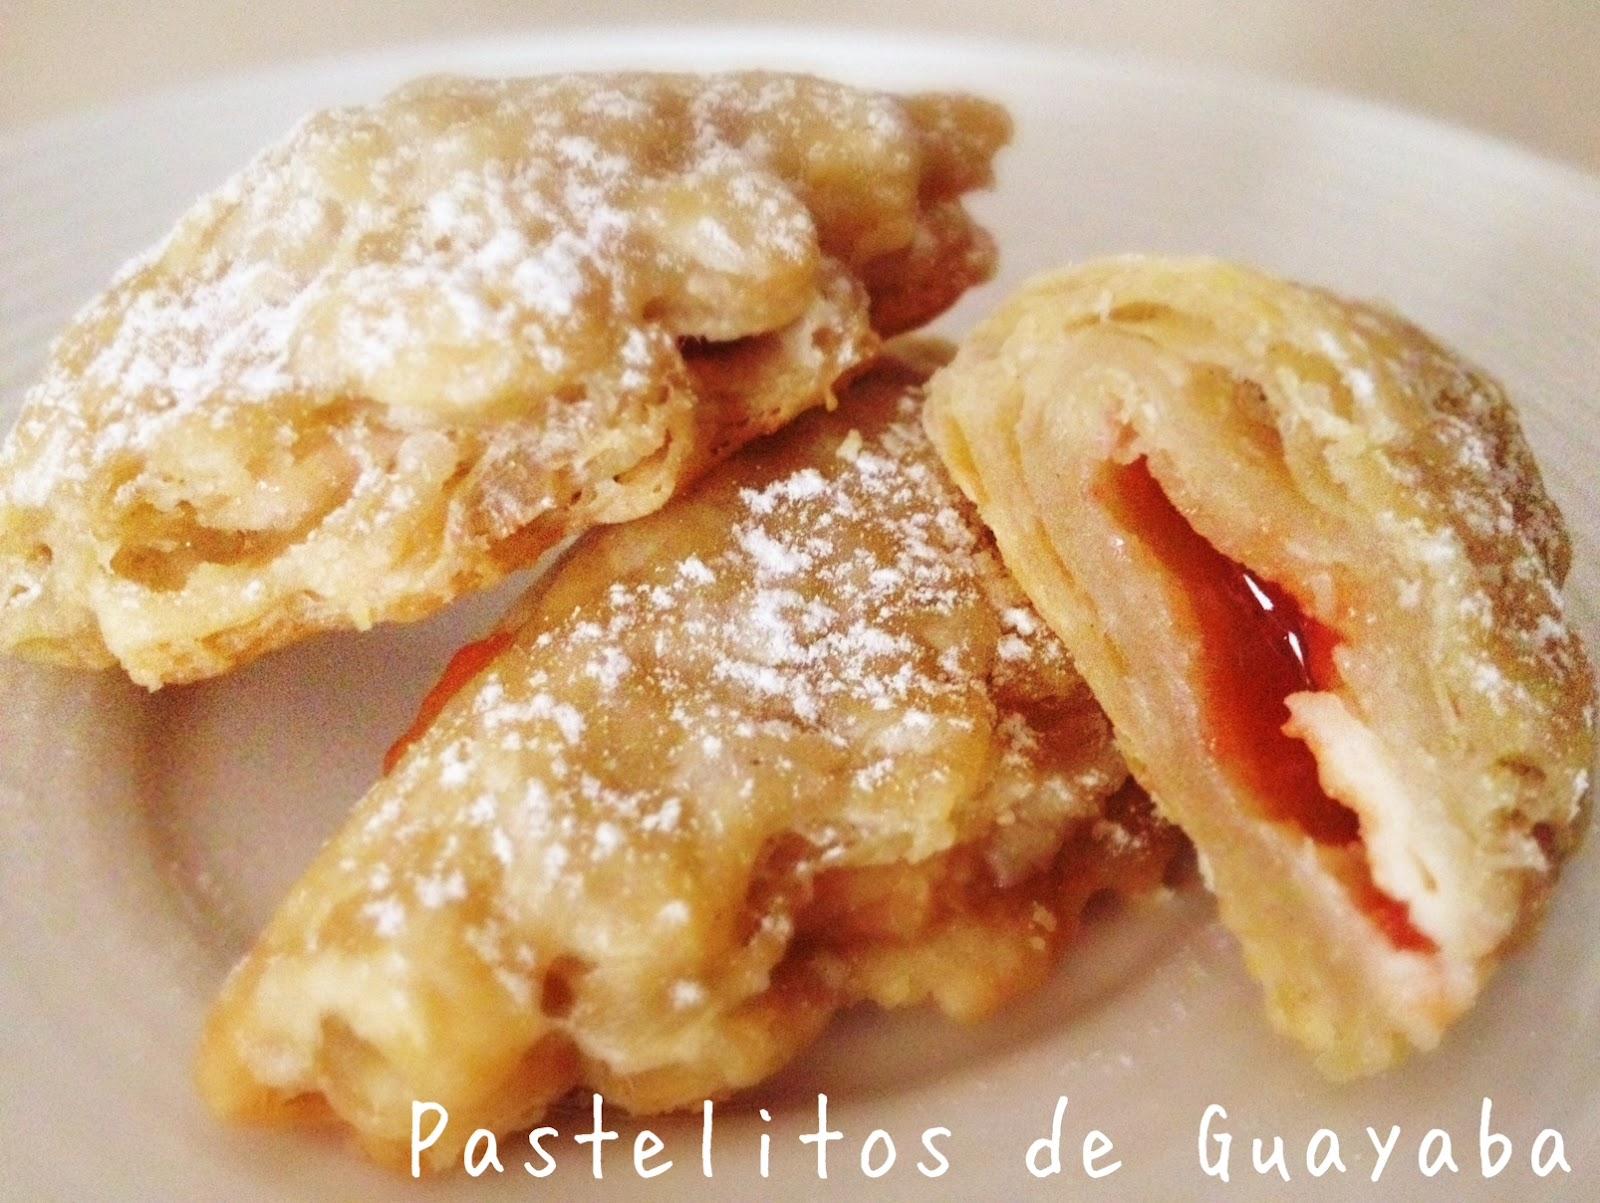 Wholly Vegan: VeganMoFo Day 4: Pastelitos de Guayaba (Guava Pastries)